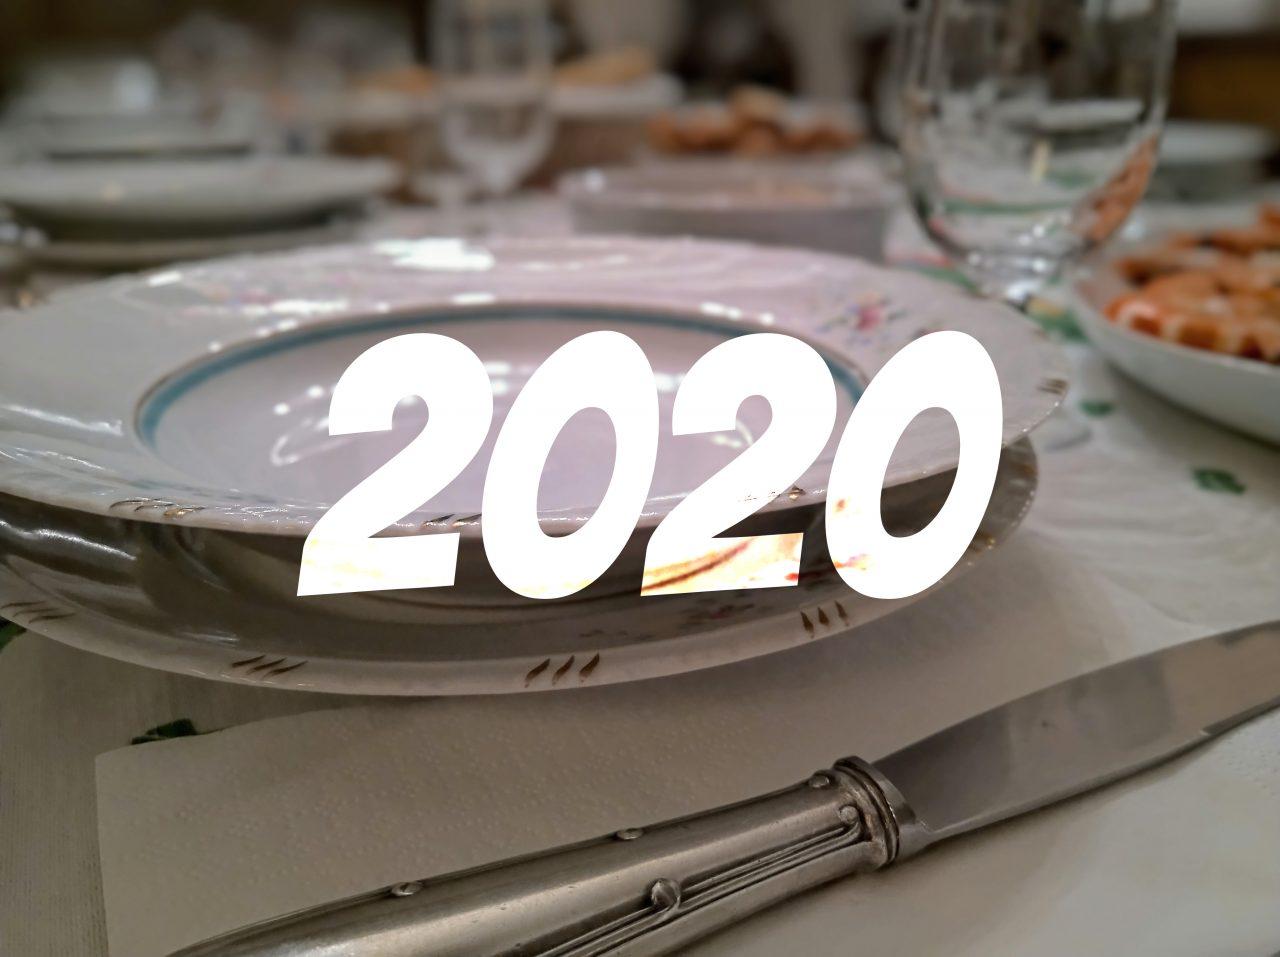 Al 2020